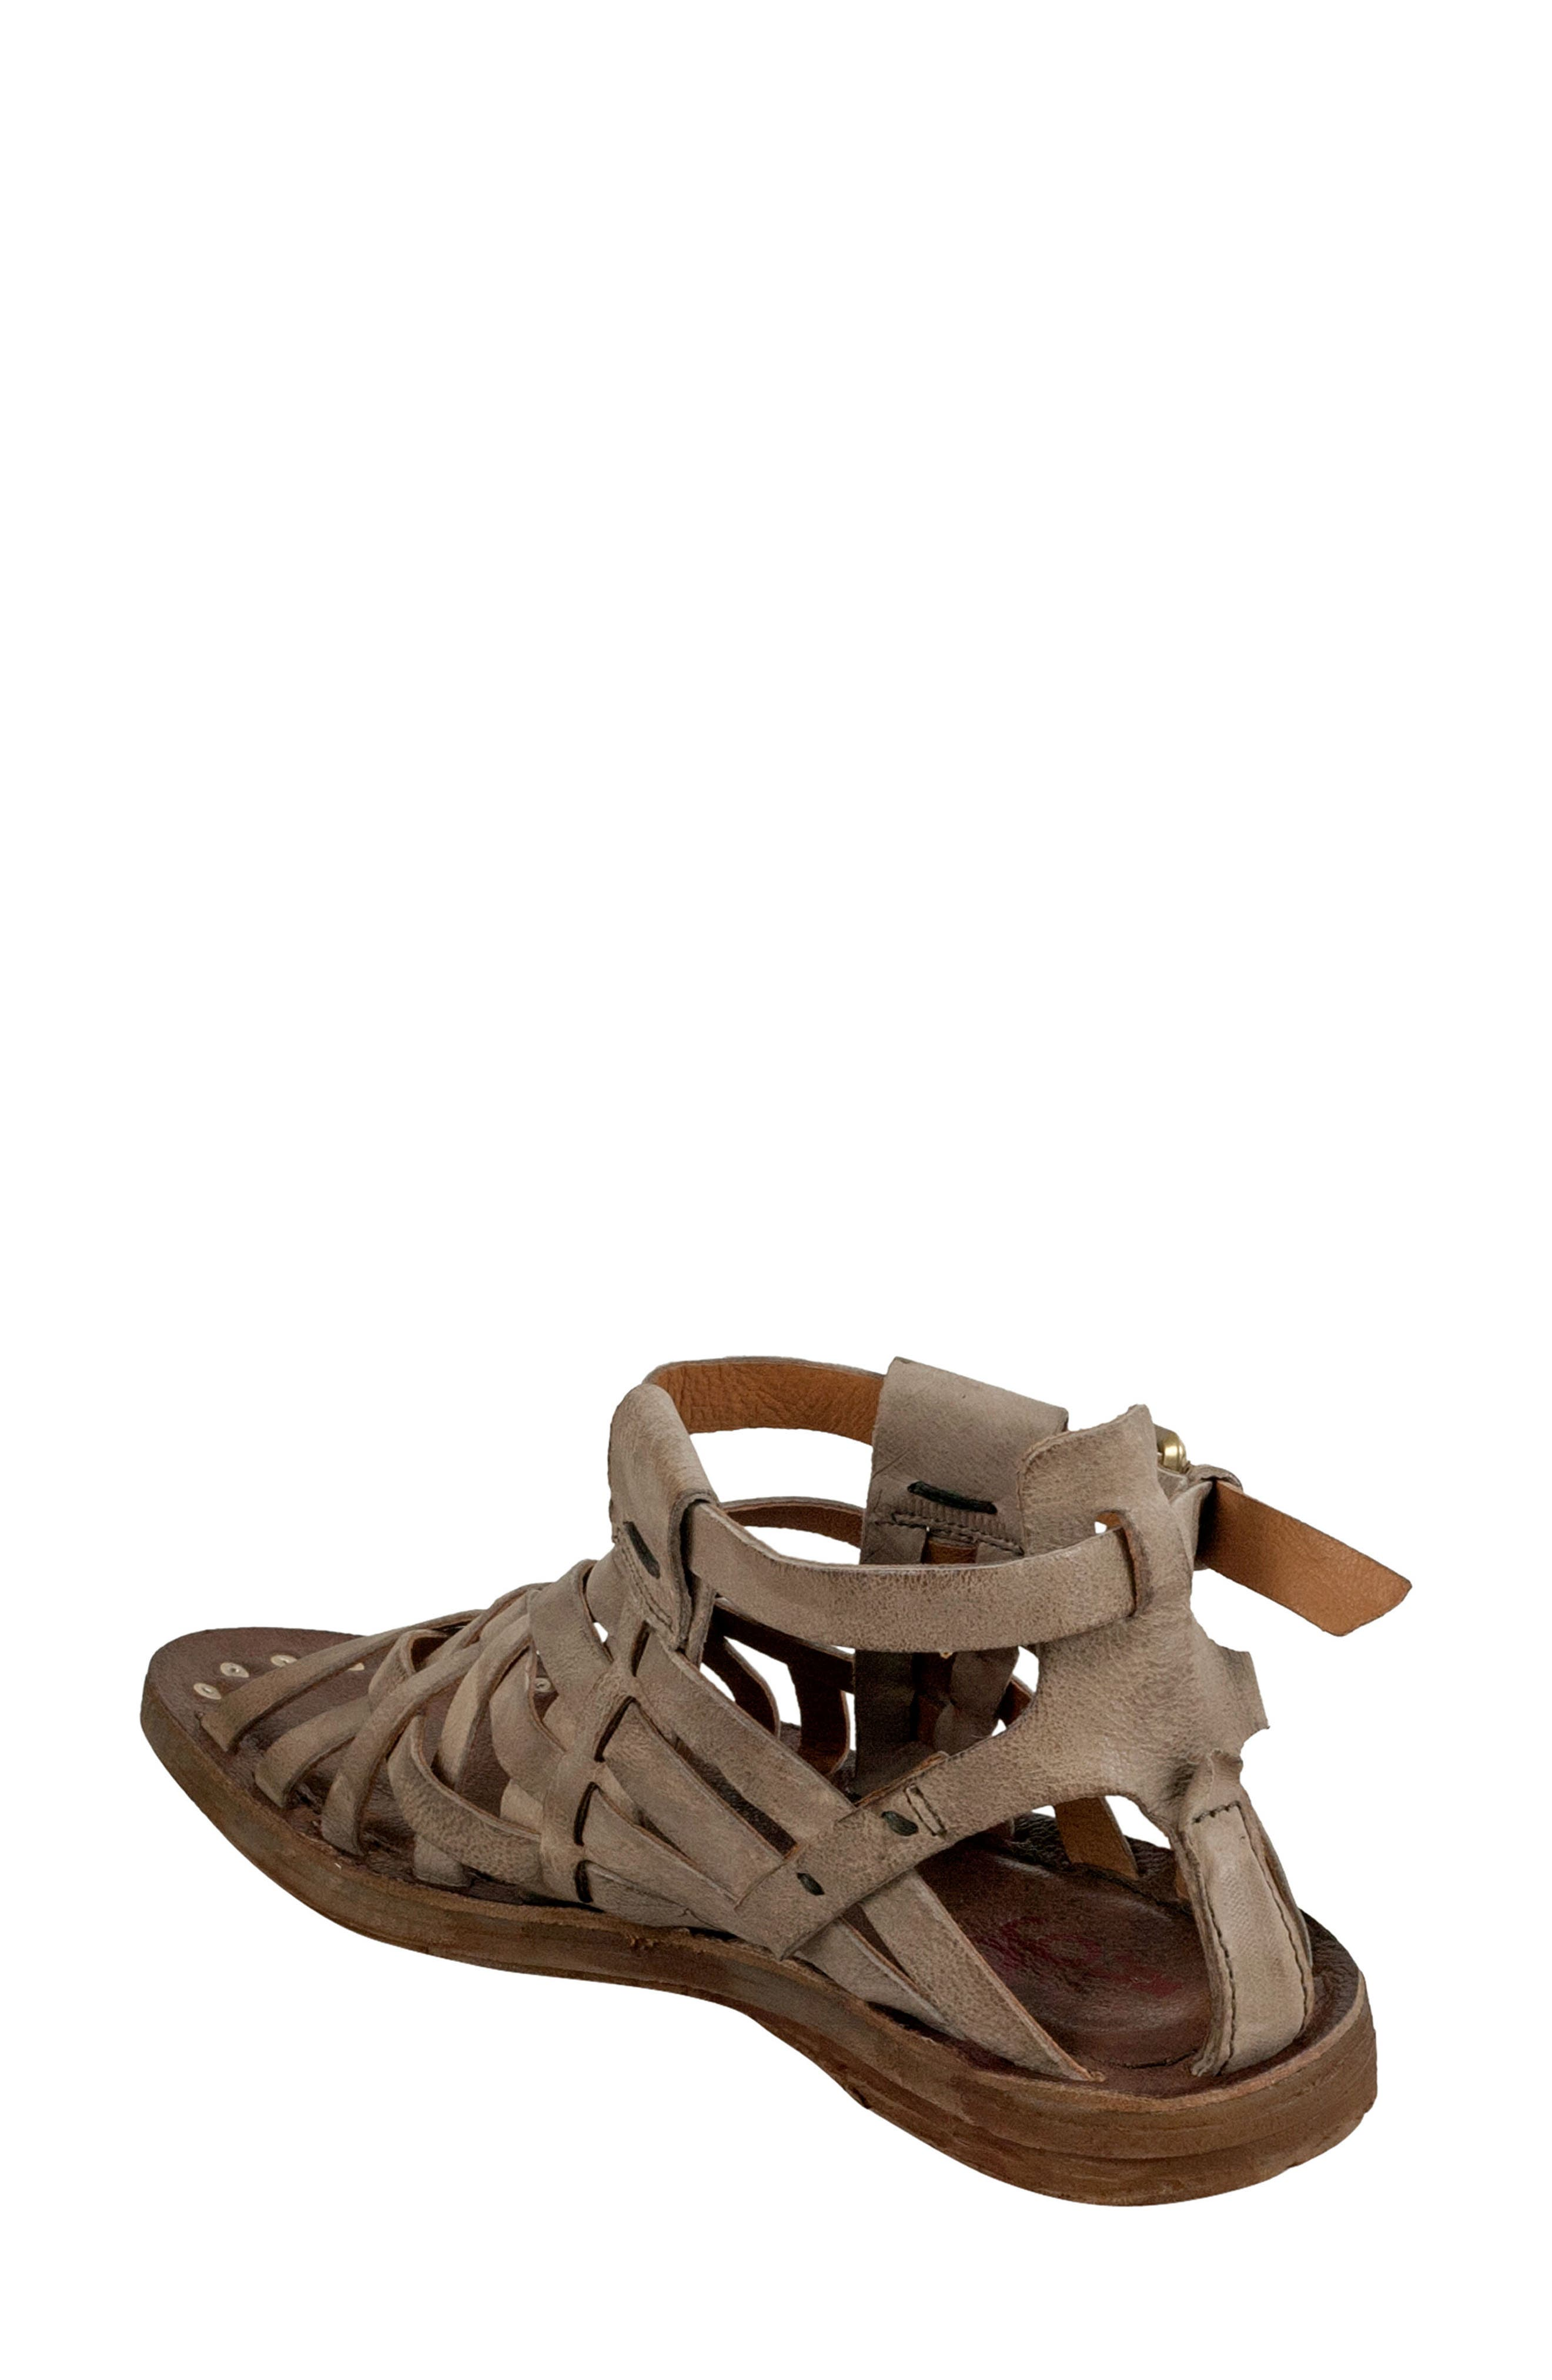 Ralston Gladiator Sandal,                             Alternate thumbnail 2, color,                             TAUPE